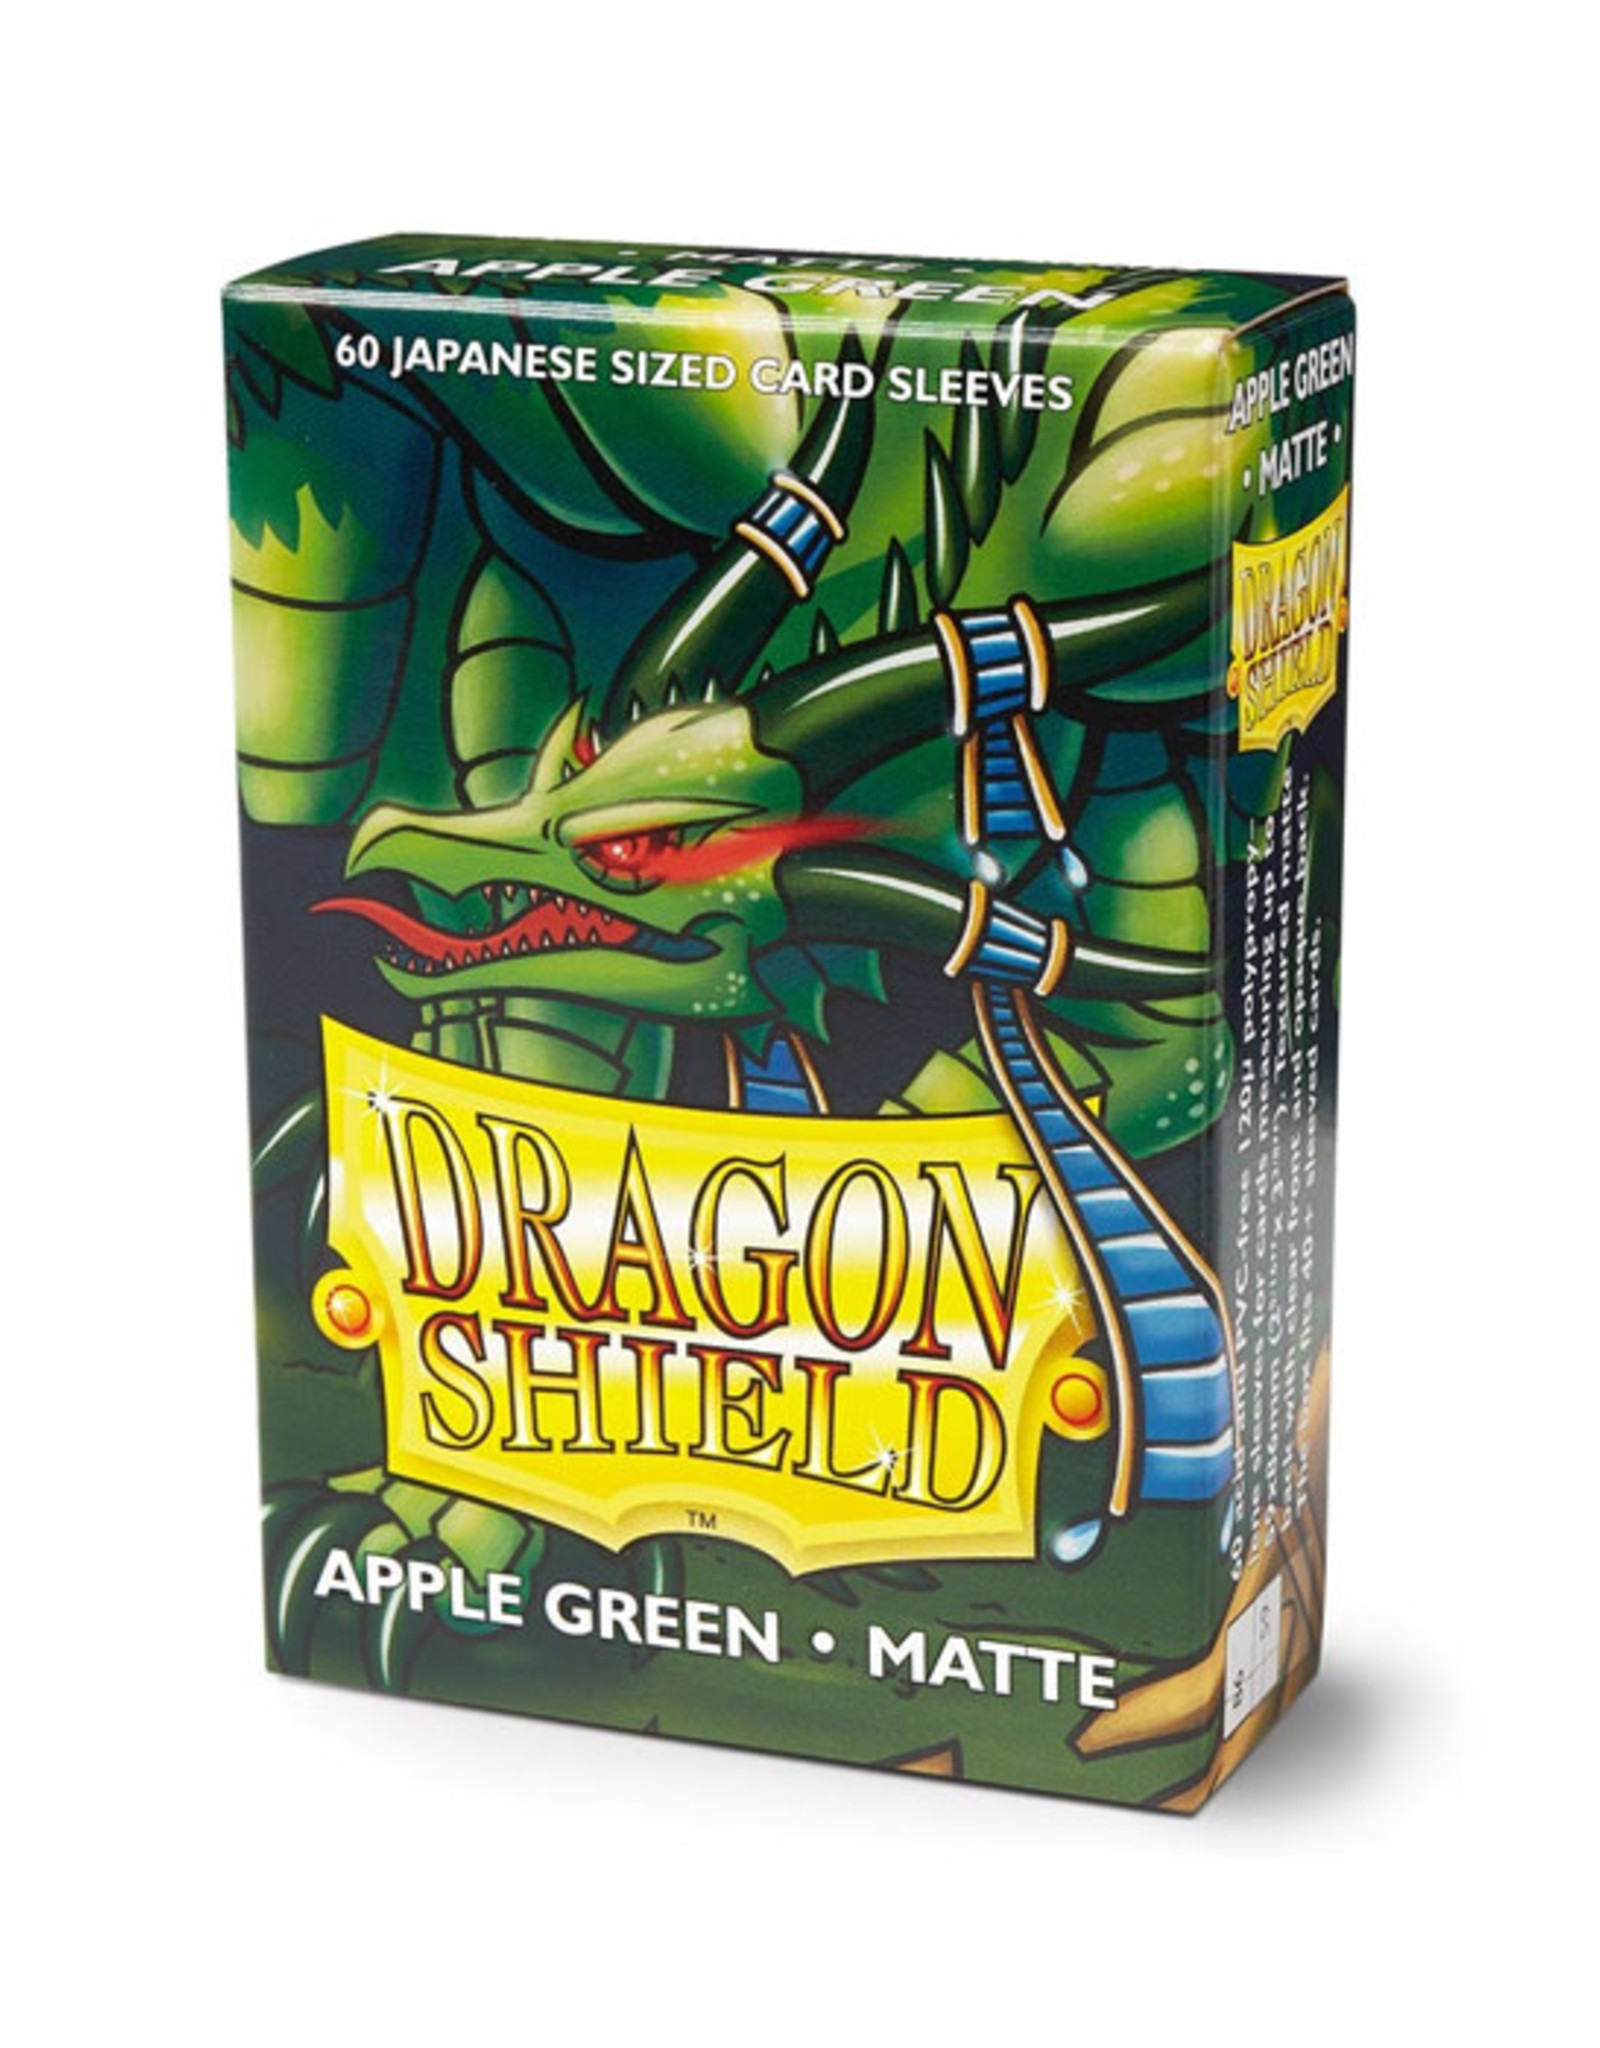 Dragon Shield Dragon Shield: Sleeves - Small - Matte - Apple Green (60)